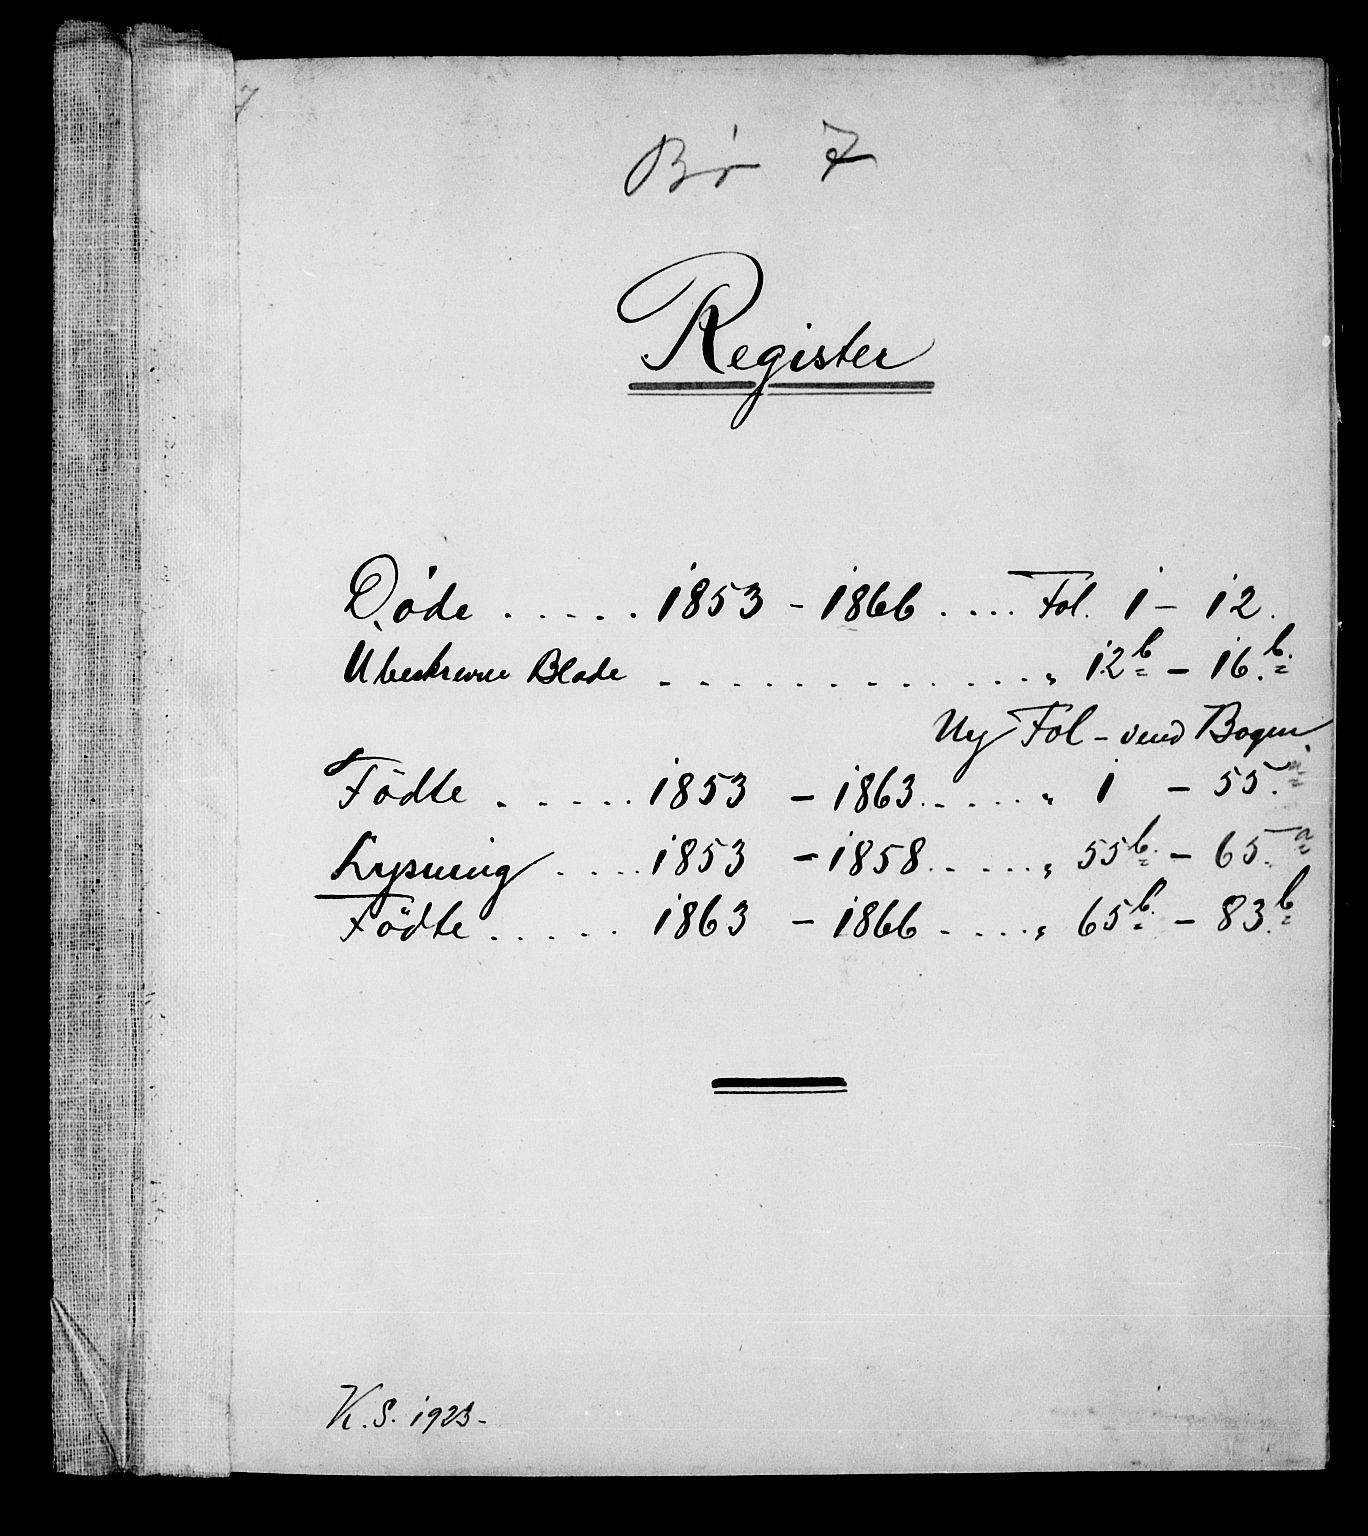 SAKO, Bø kirkebøker, G/Ga/L0002: Klokkerbok nr. 2, 1853-1866